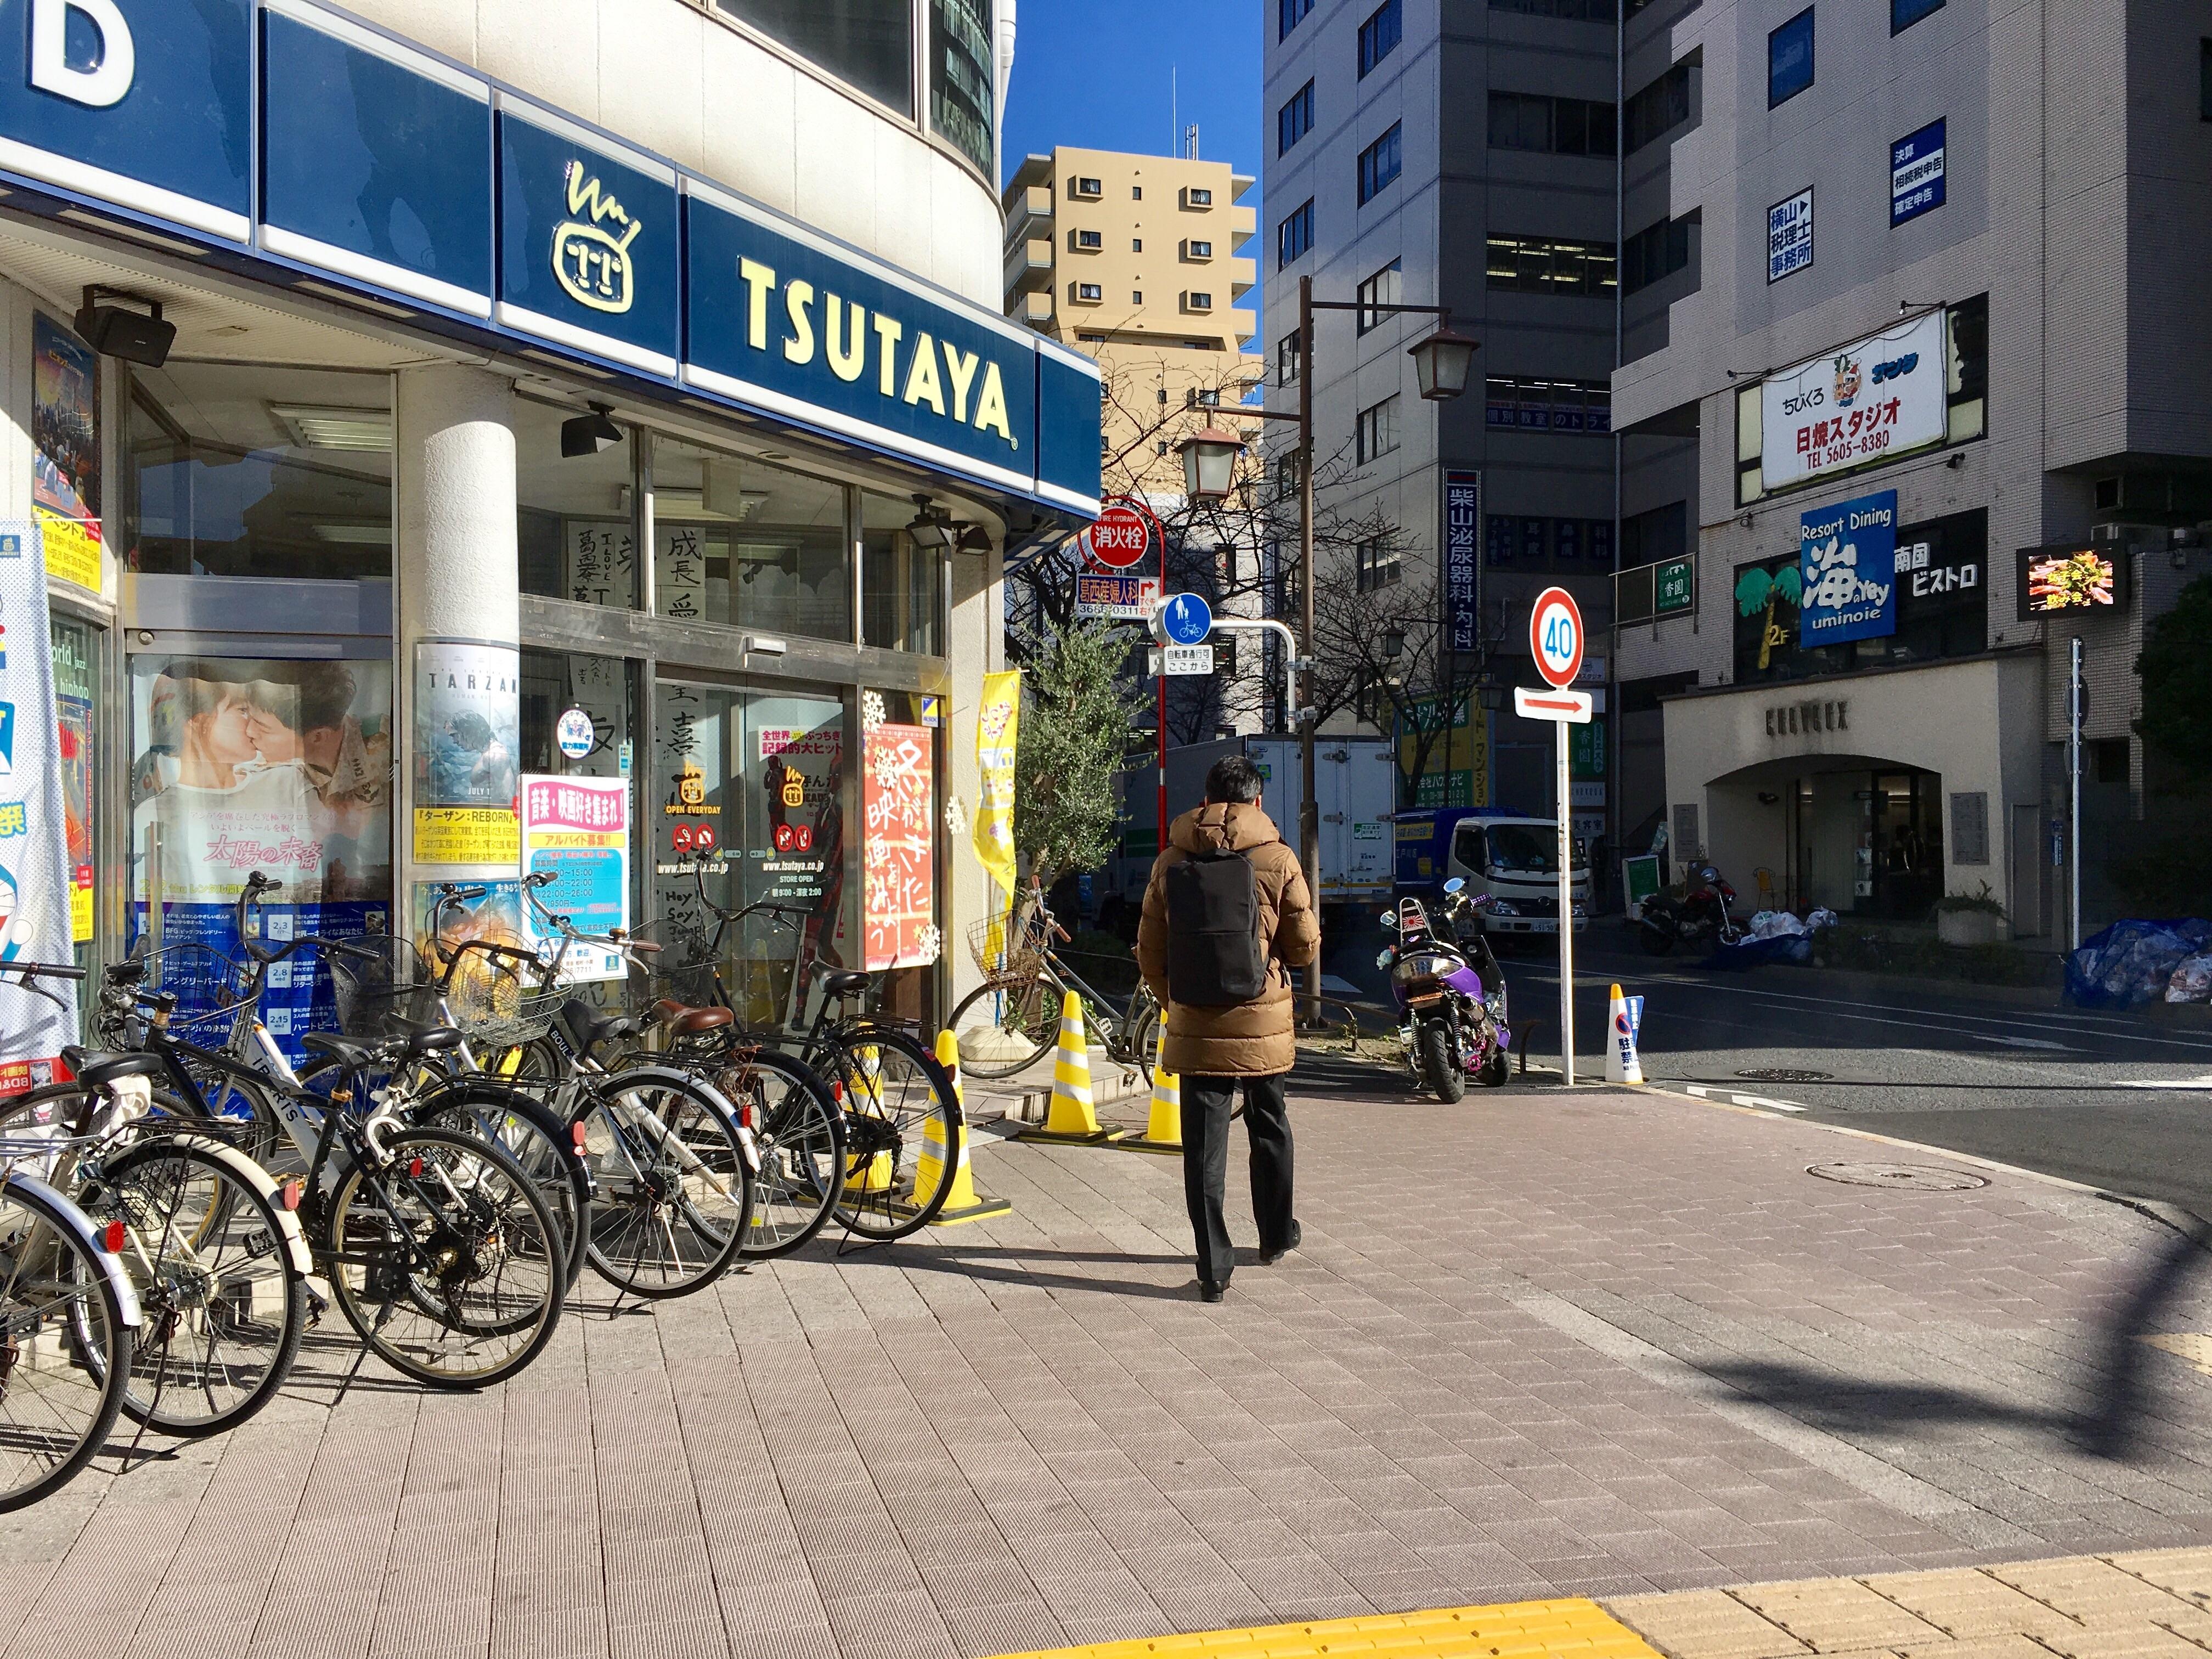 f:id:SoichiroIkeshita:20170126004255j:image